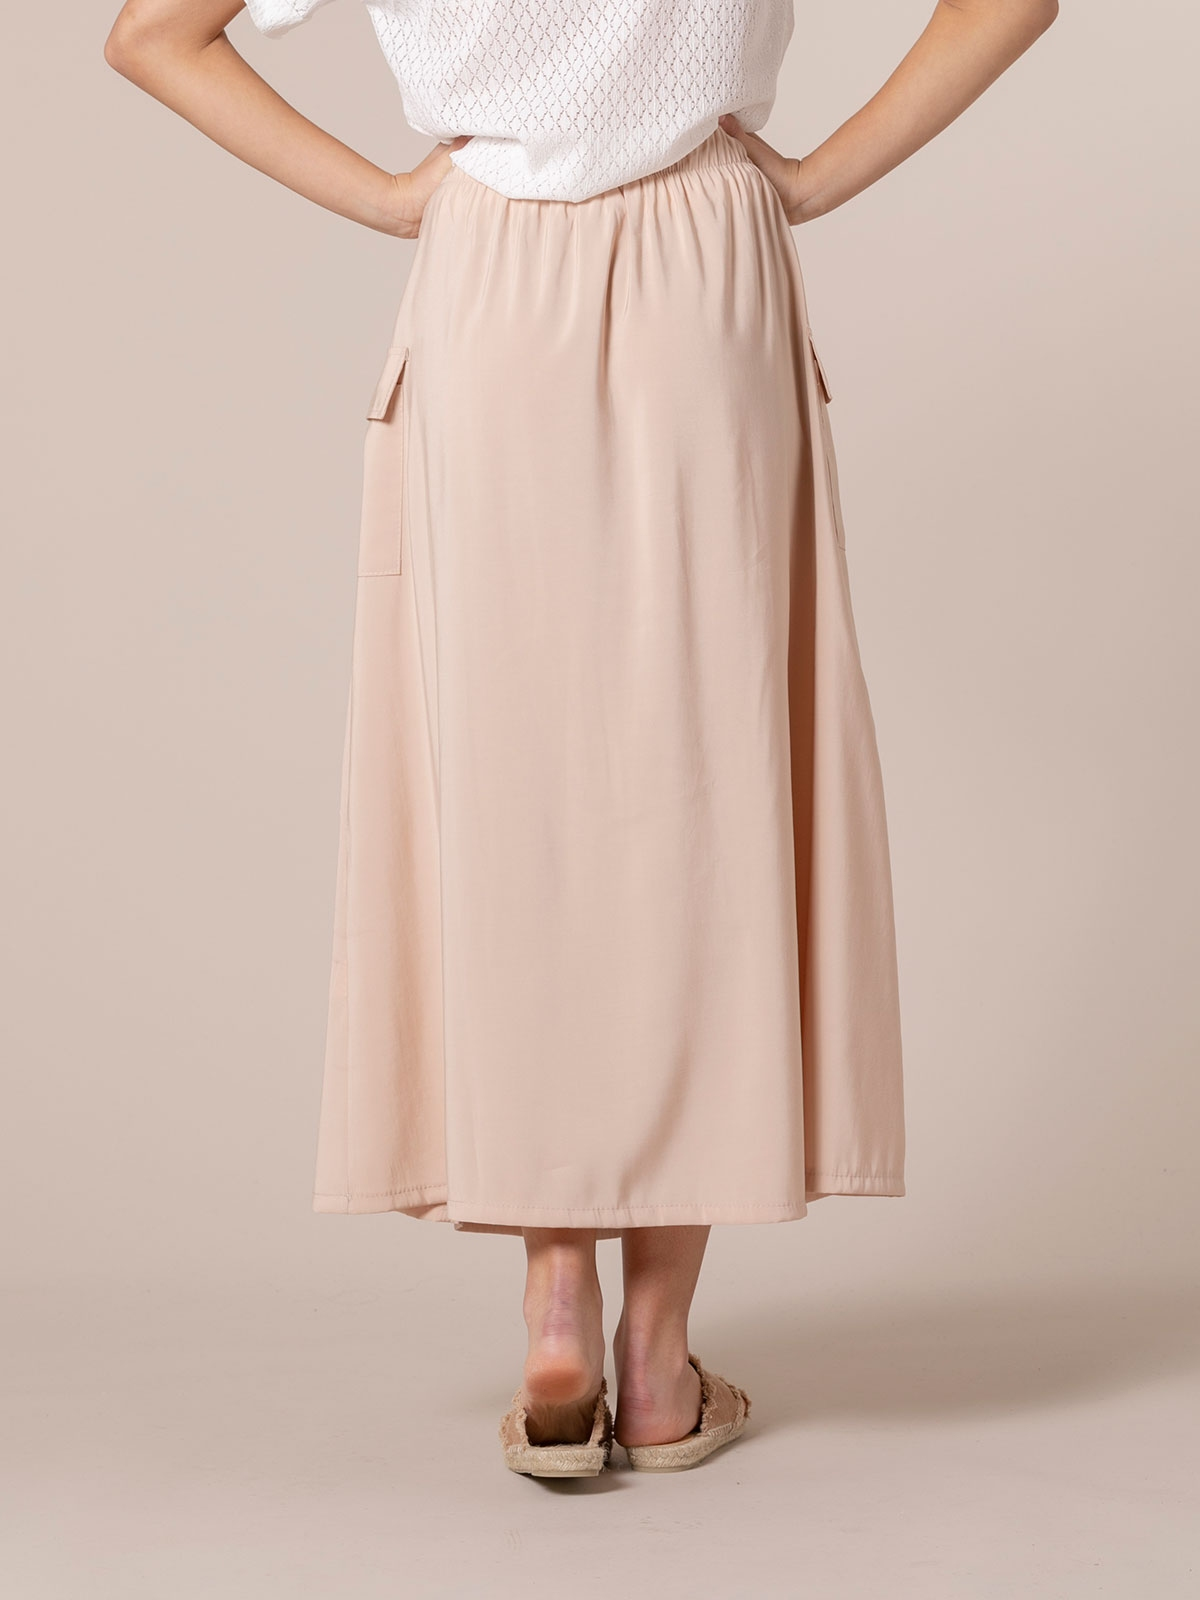 Falda larga mujer fluida botones Beige